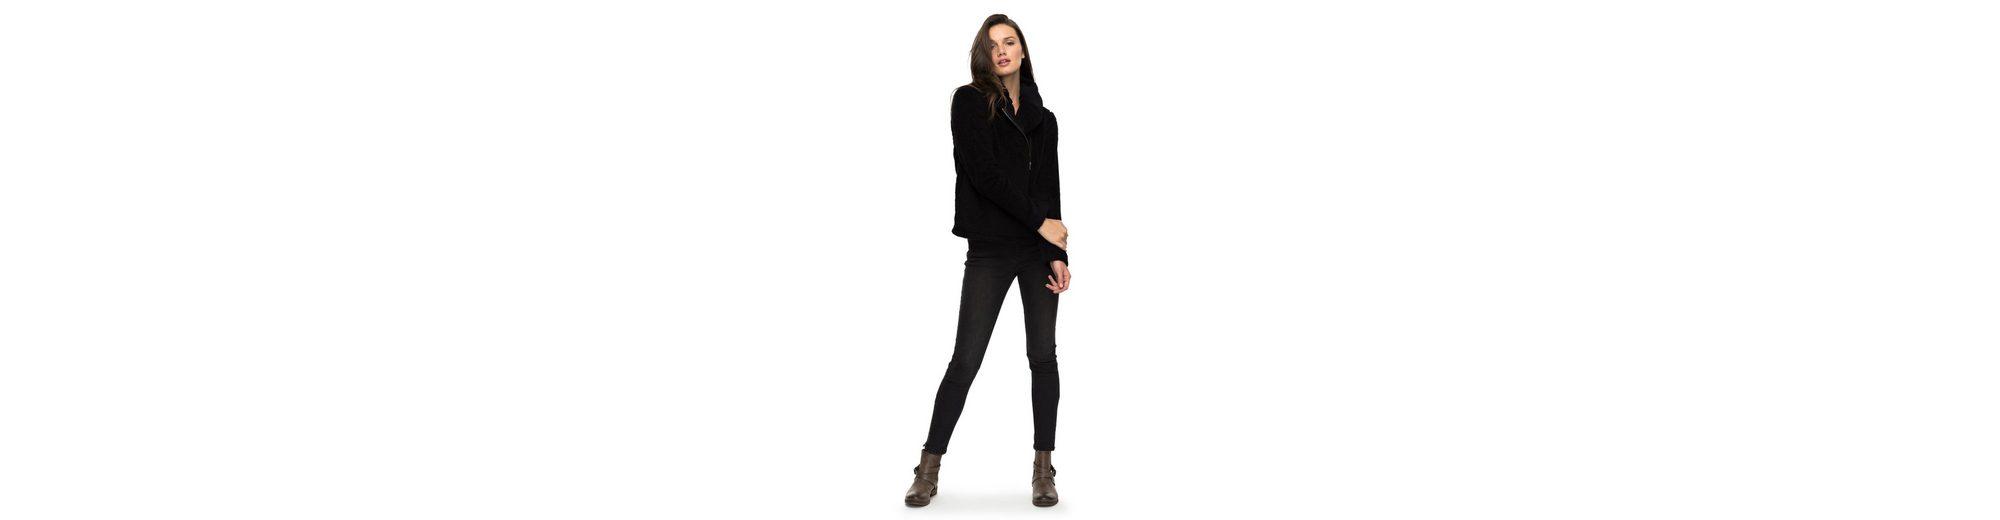 Roxy Plüsch-Fleece-Jacke Dream Freely Outlet Kaufen Sehr Billig Günstig Online pAYoKoAJ5